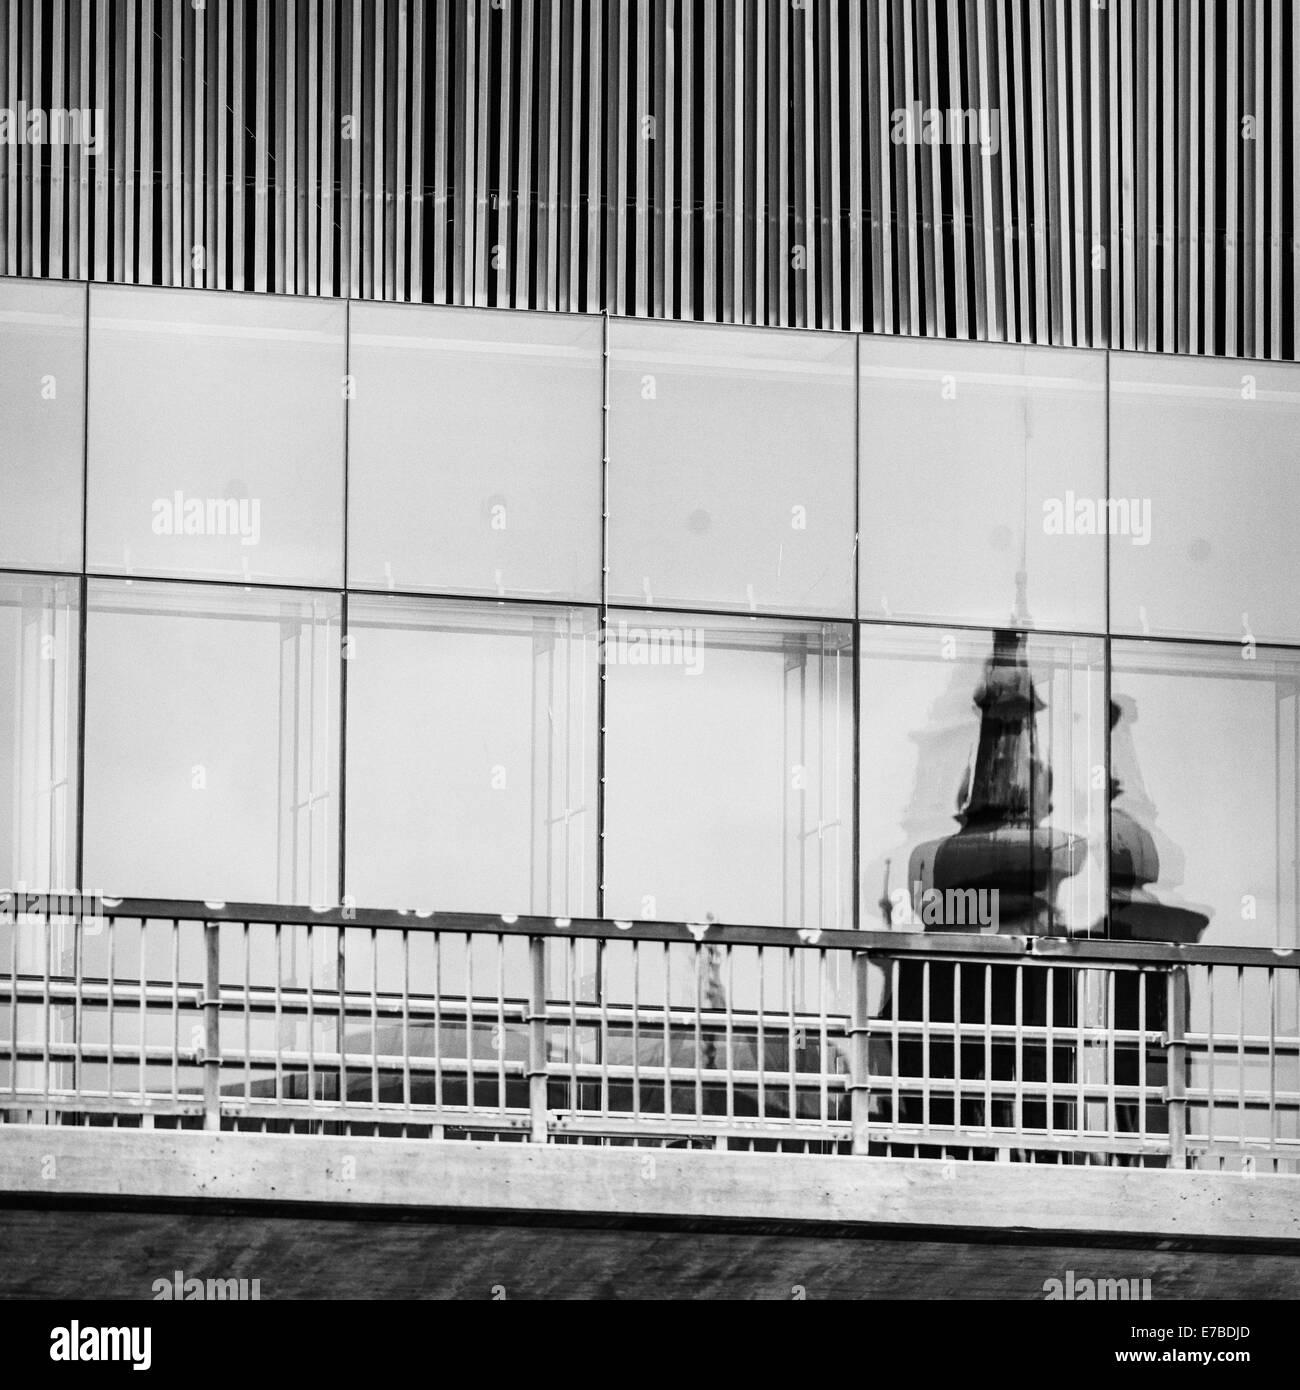 Building exterior, modern architecture in Stockholm, Sweden - Stock Image